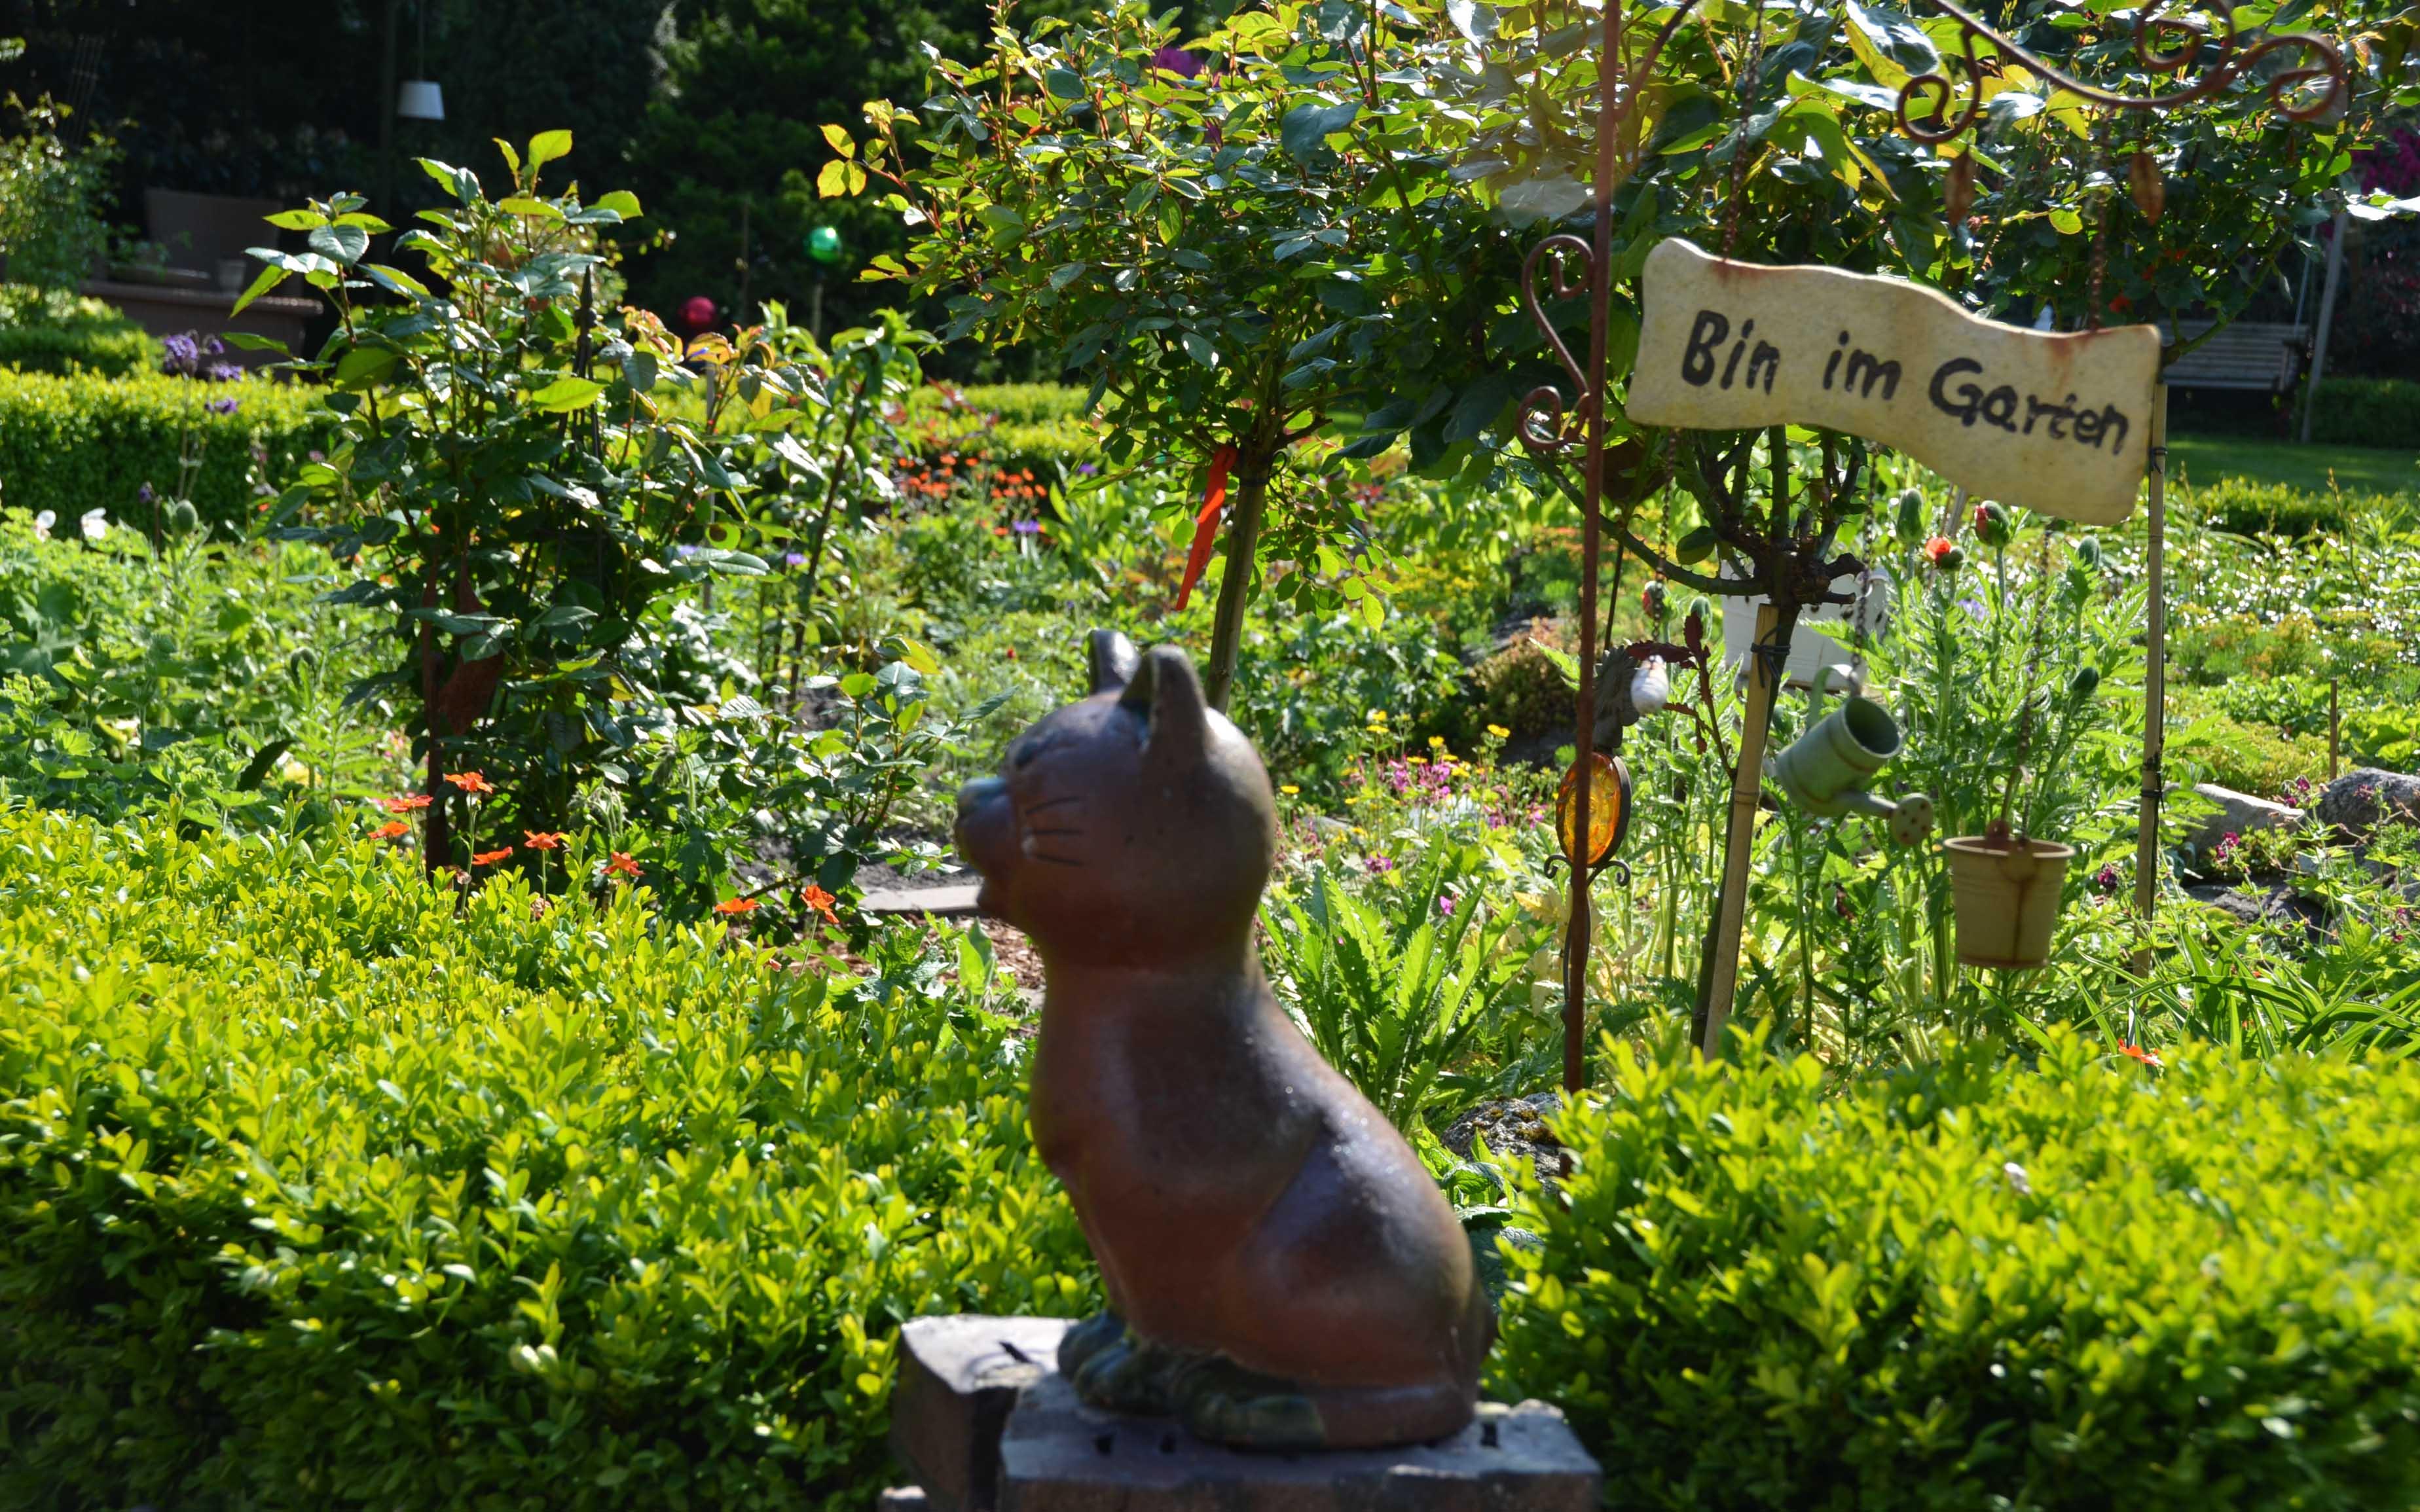 Gartenschild1